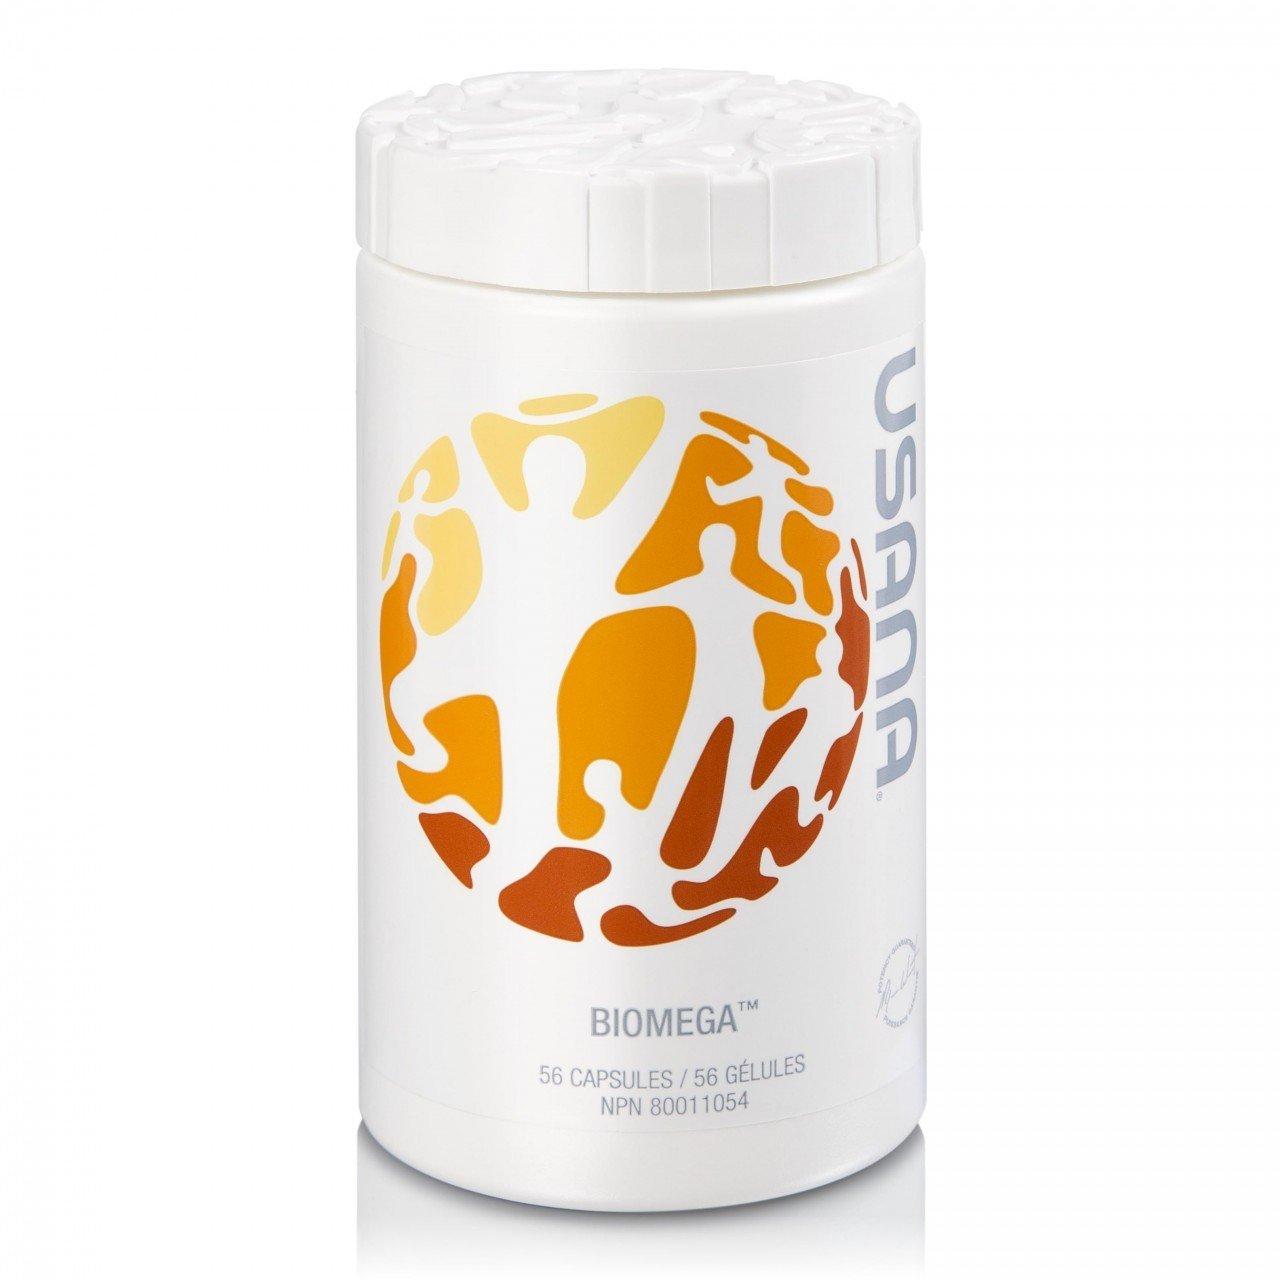 USANA Biomega Fish Oil Dietary Supplement (56 Capsules)